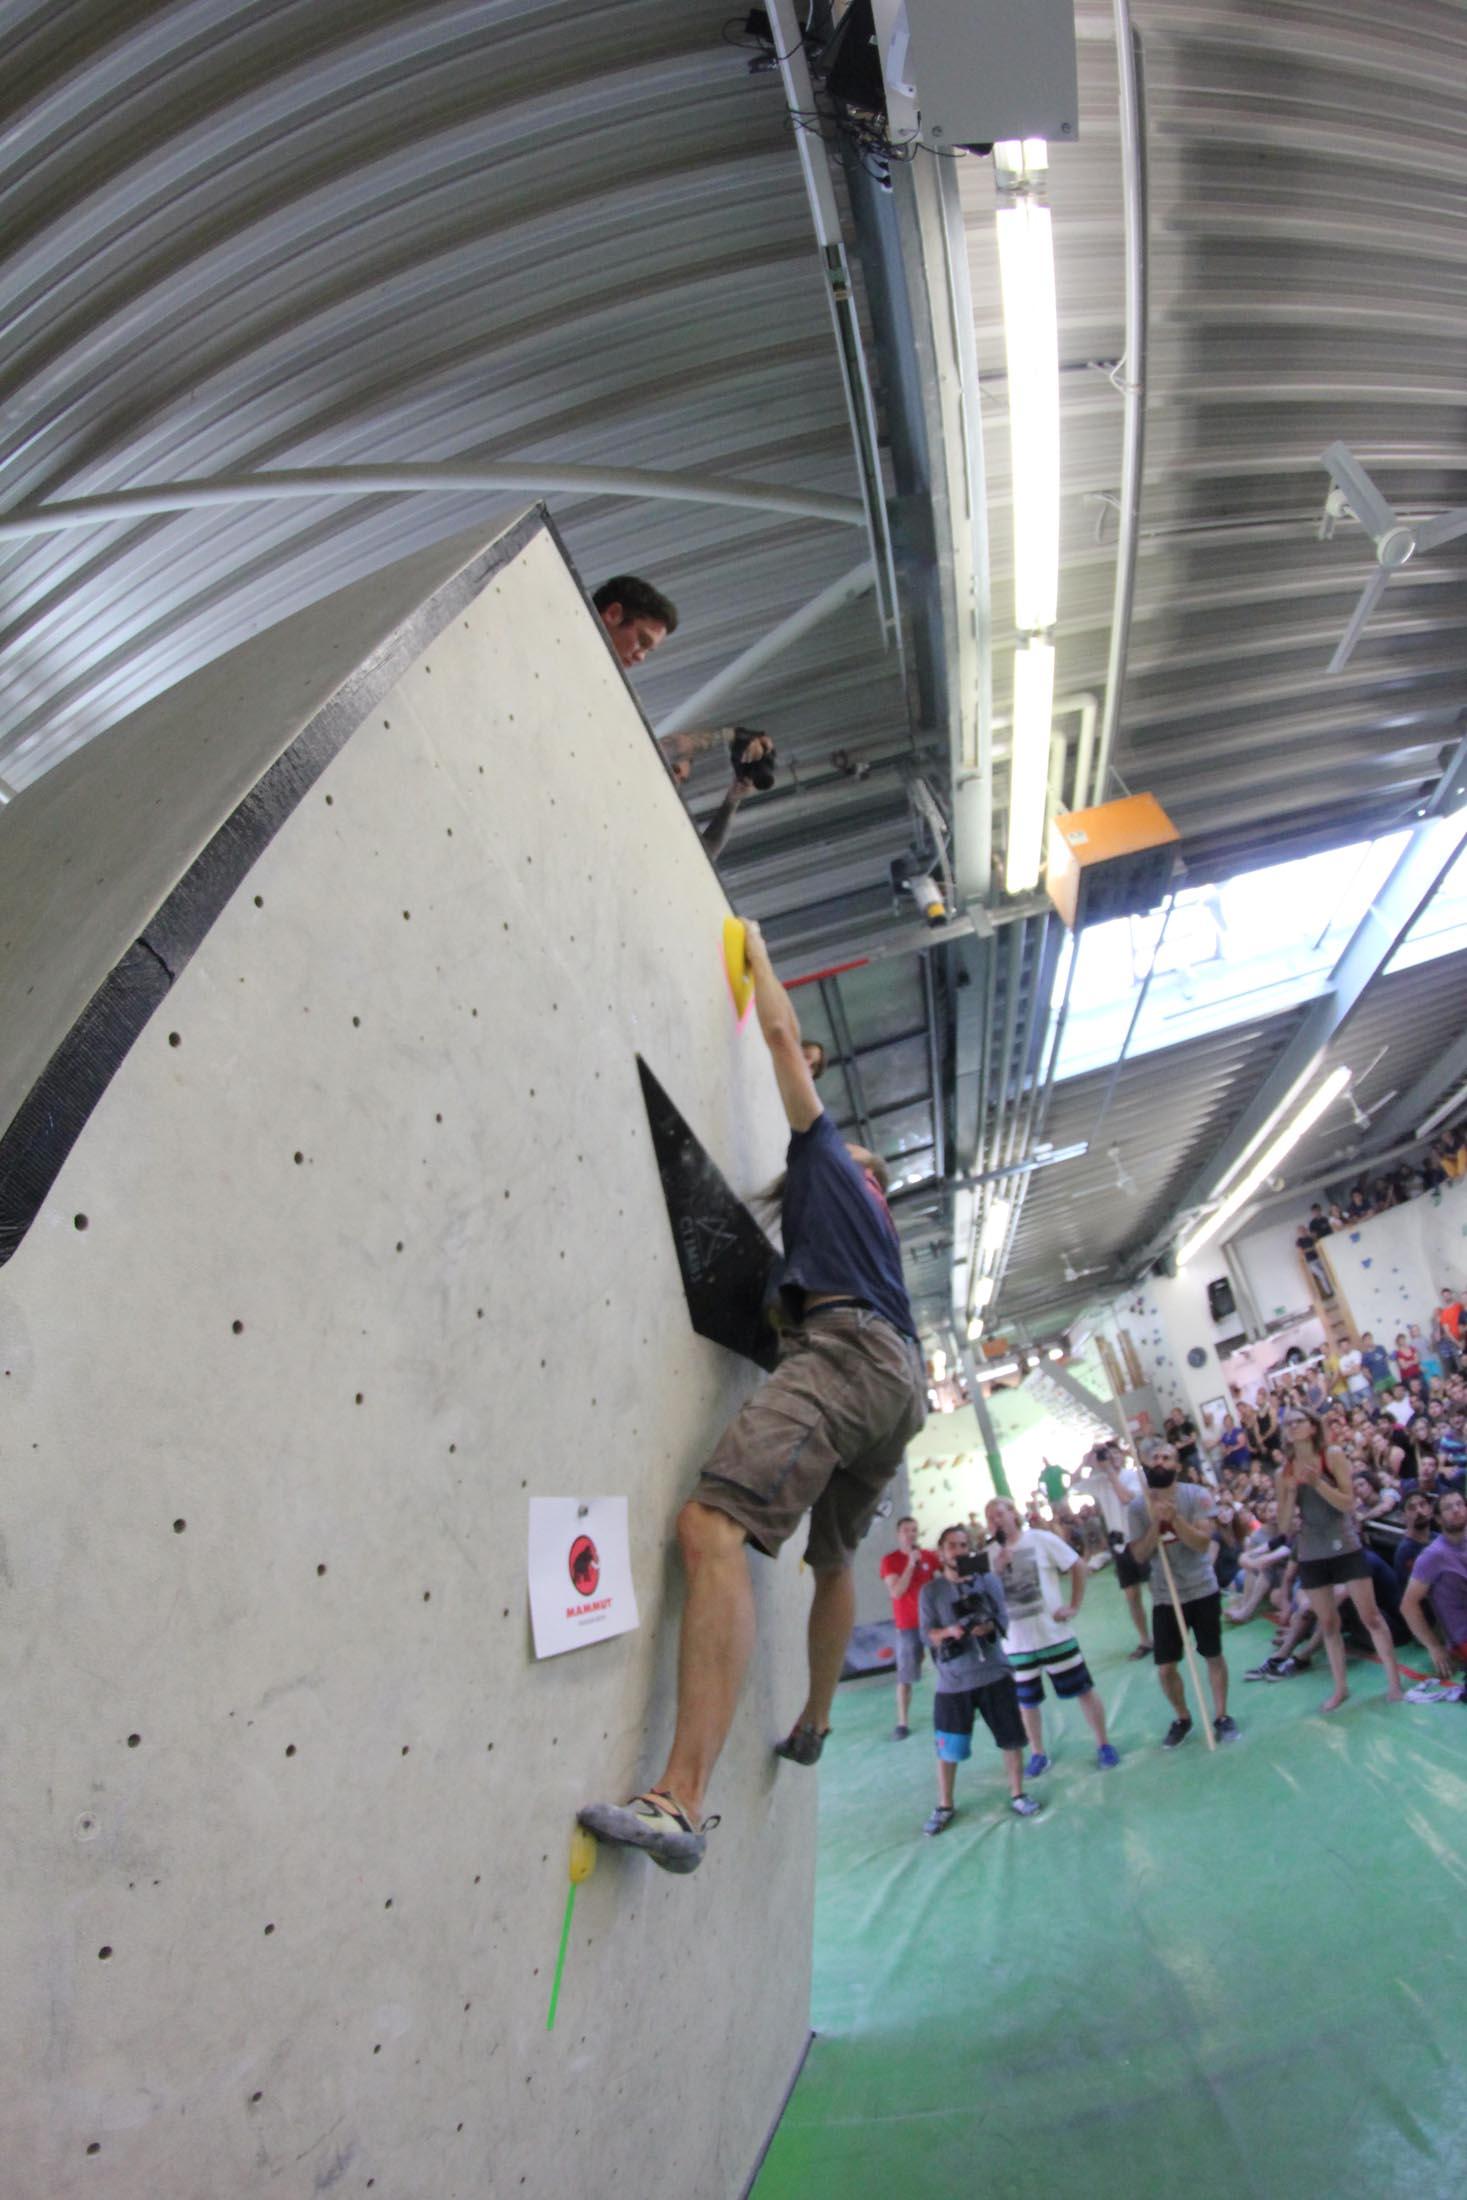 Finale, internationaler bouldercup Frankenjura 2016, BLOCKHELDEN Erlangen, Mammut, Bergfreunde.de, Boulderwettkampf07092016549